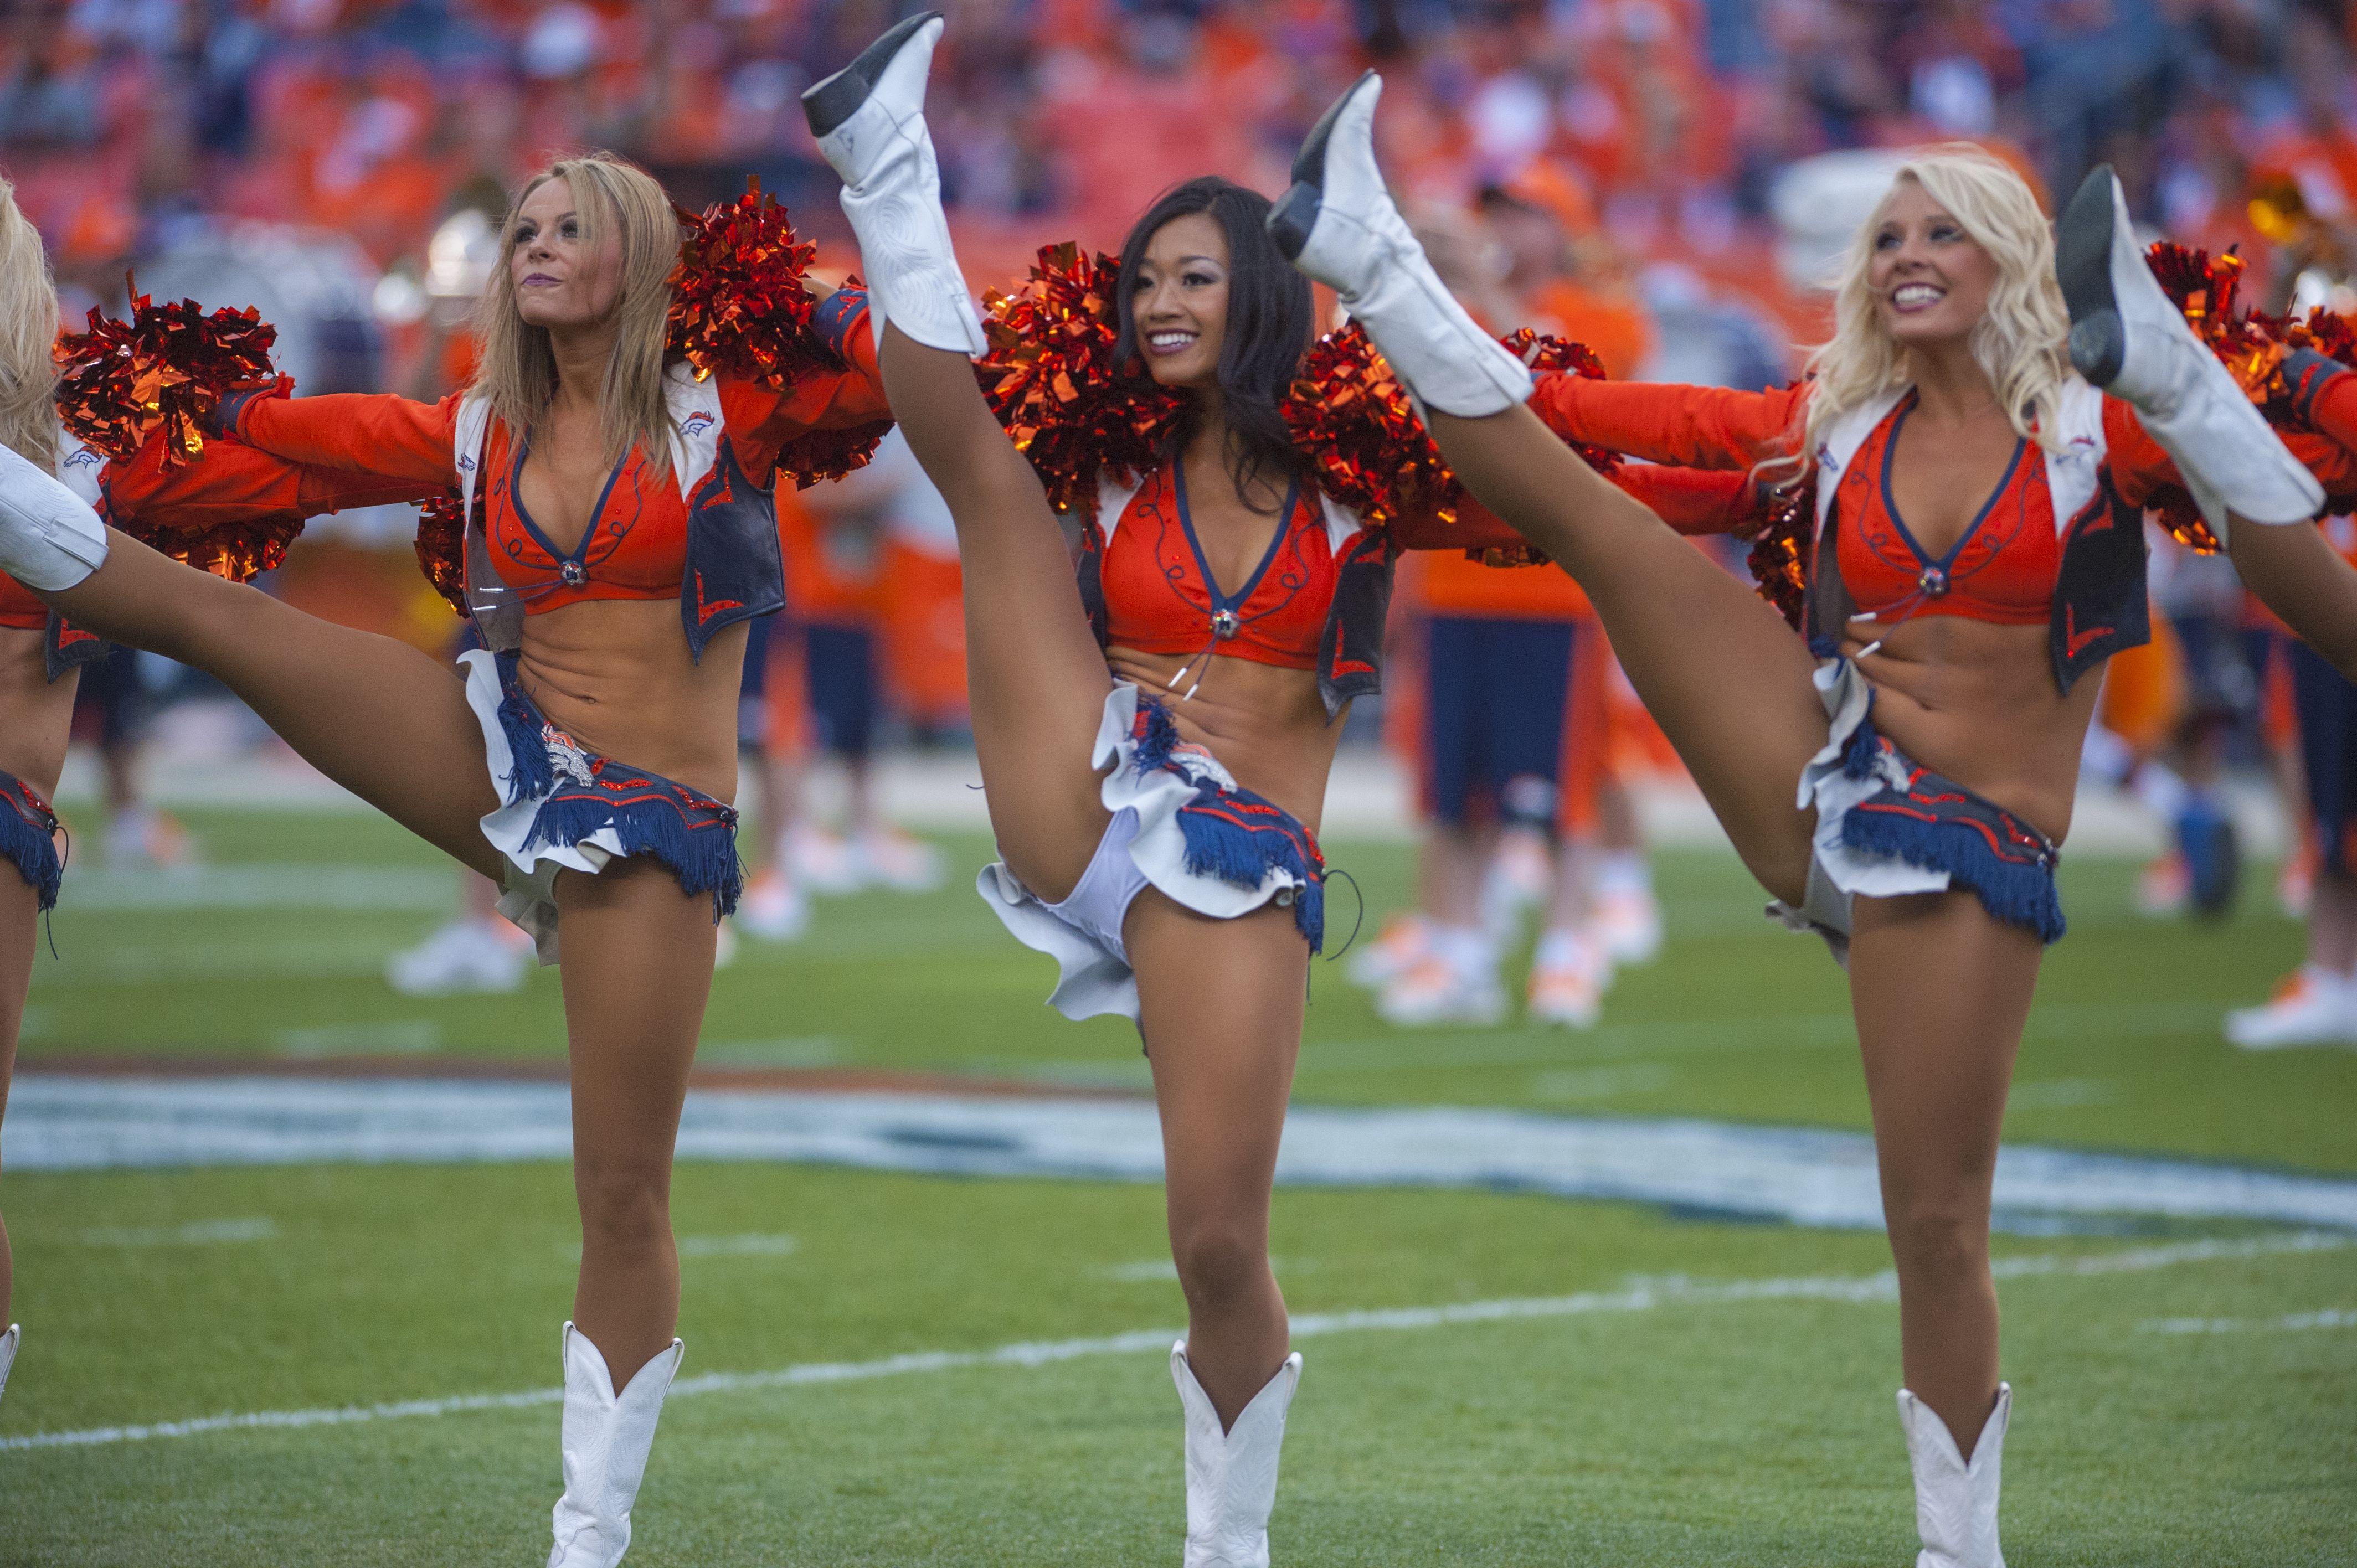 File:Dallas Cowboys cheerleaders Kick Line.jpg - Wikimedia Commons